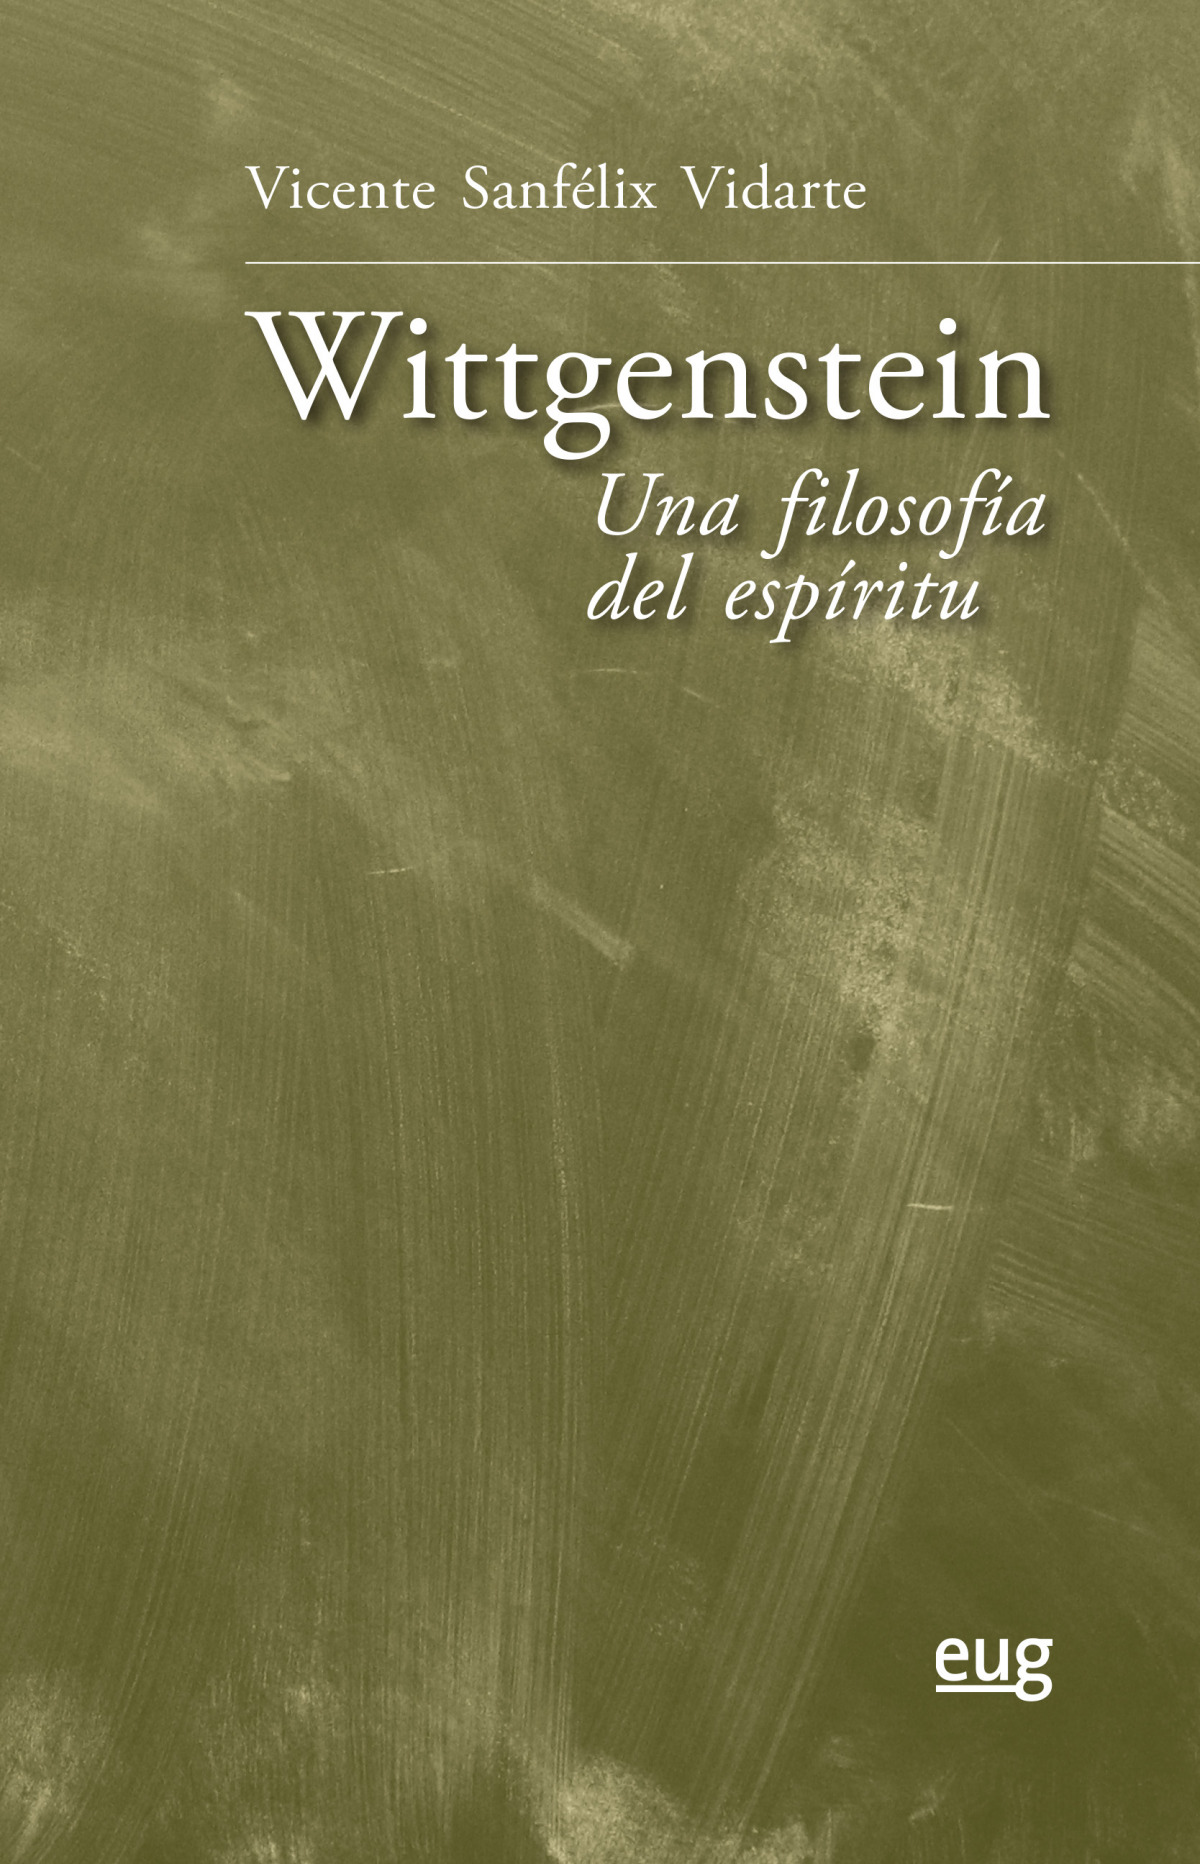 Wittgenstein: una filosofía del espíritu - Sanfélix Vidarte, Vicente